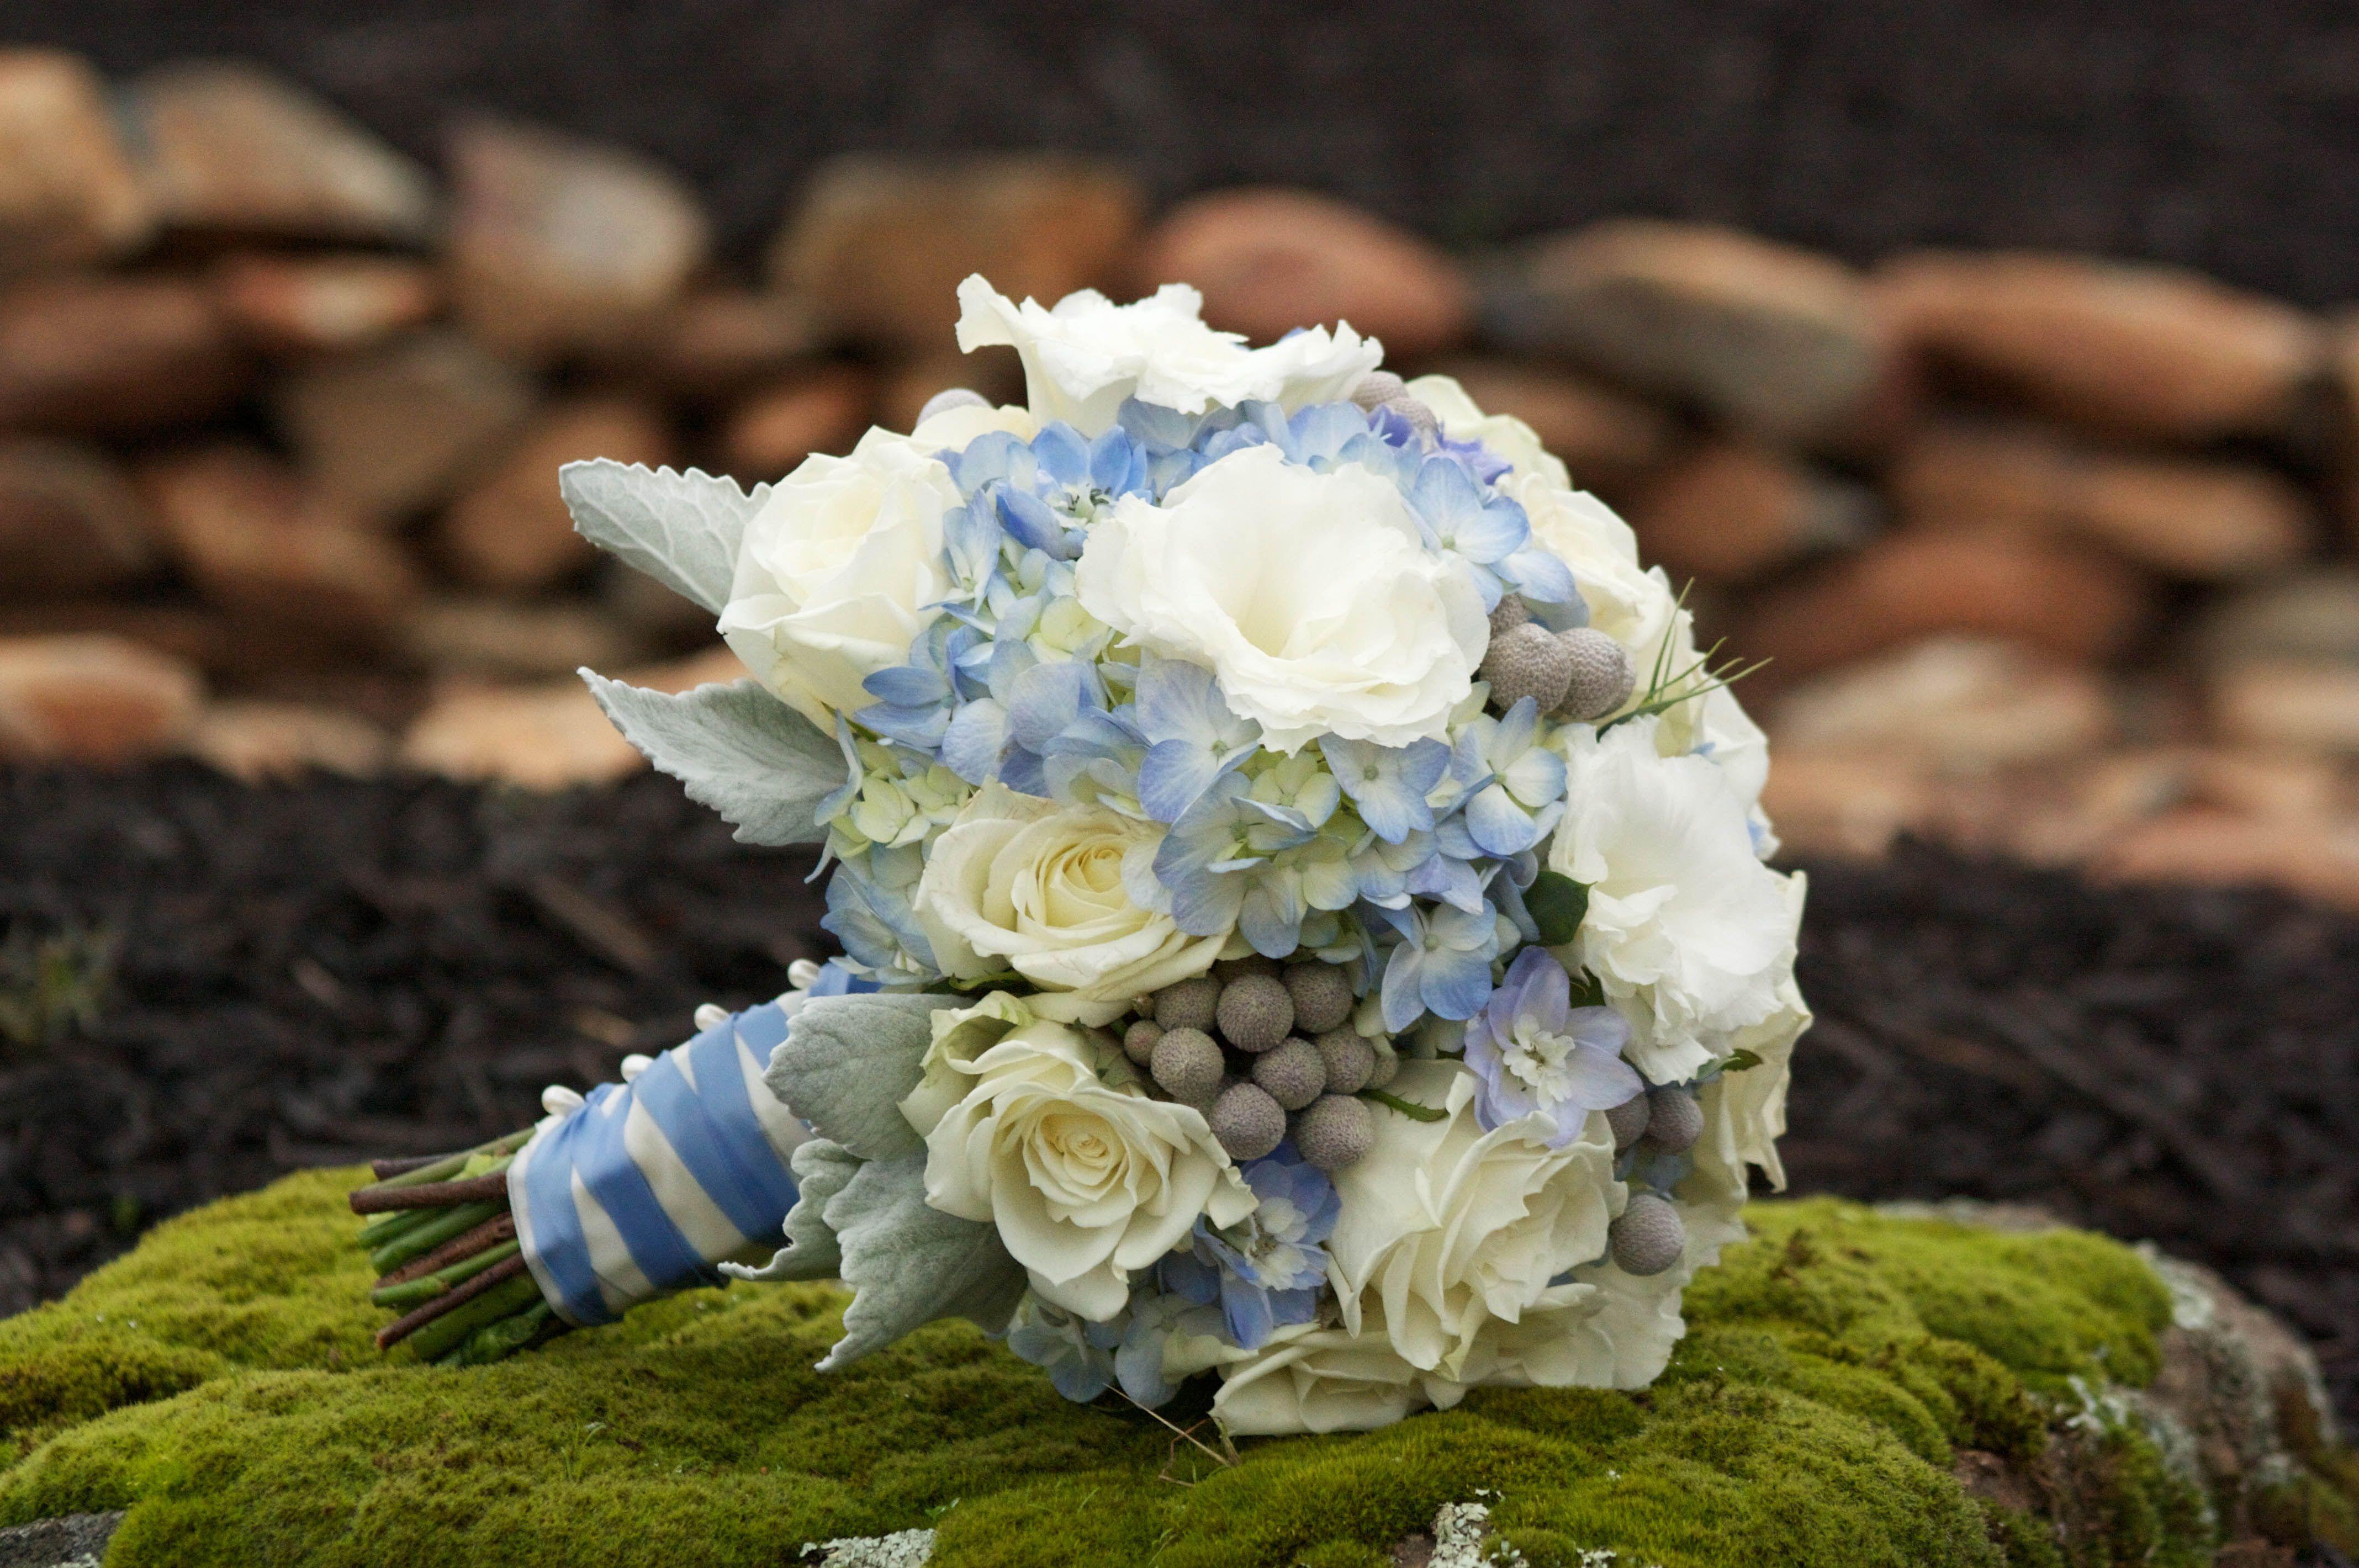 Wedding bouquets blue wedding by designs blue and yellow flower wedding bouquets blue wedding by designs blue and yellow flower wedding collection izmirmasajfo